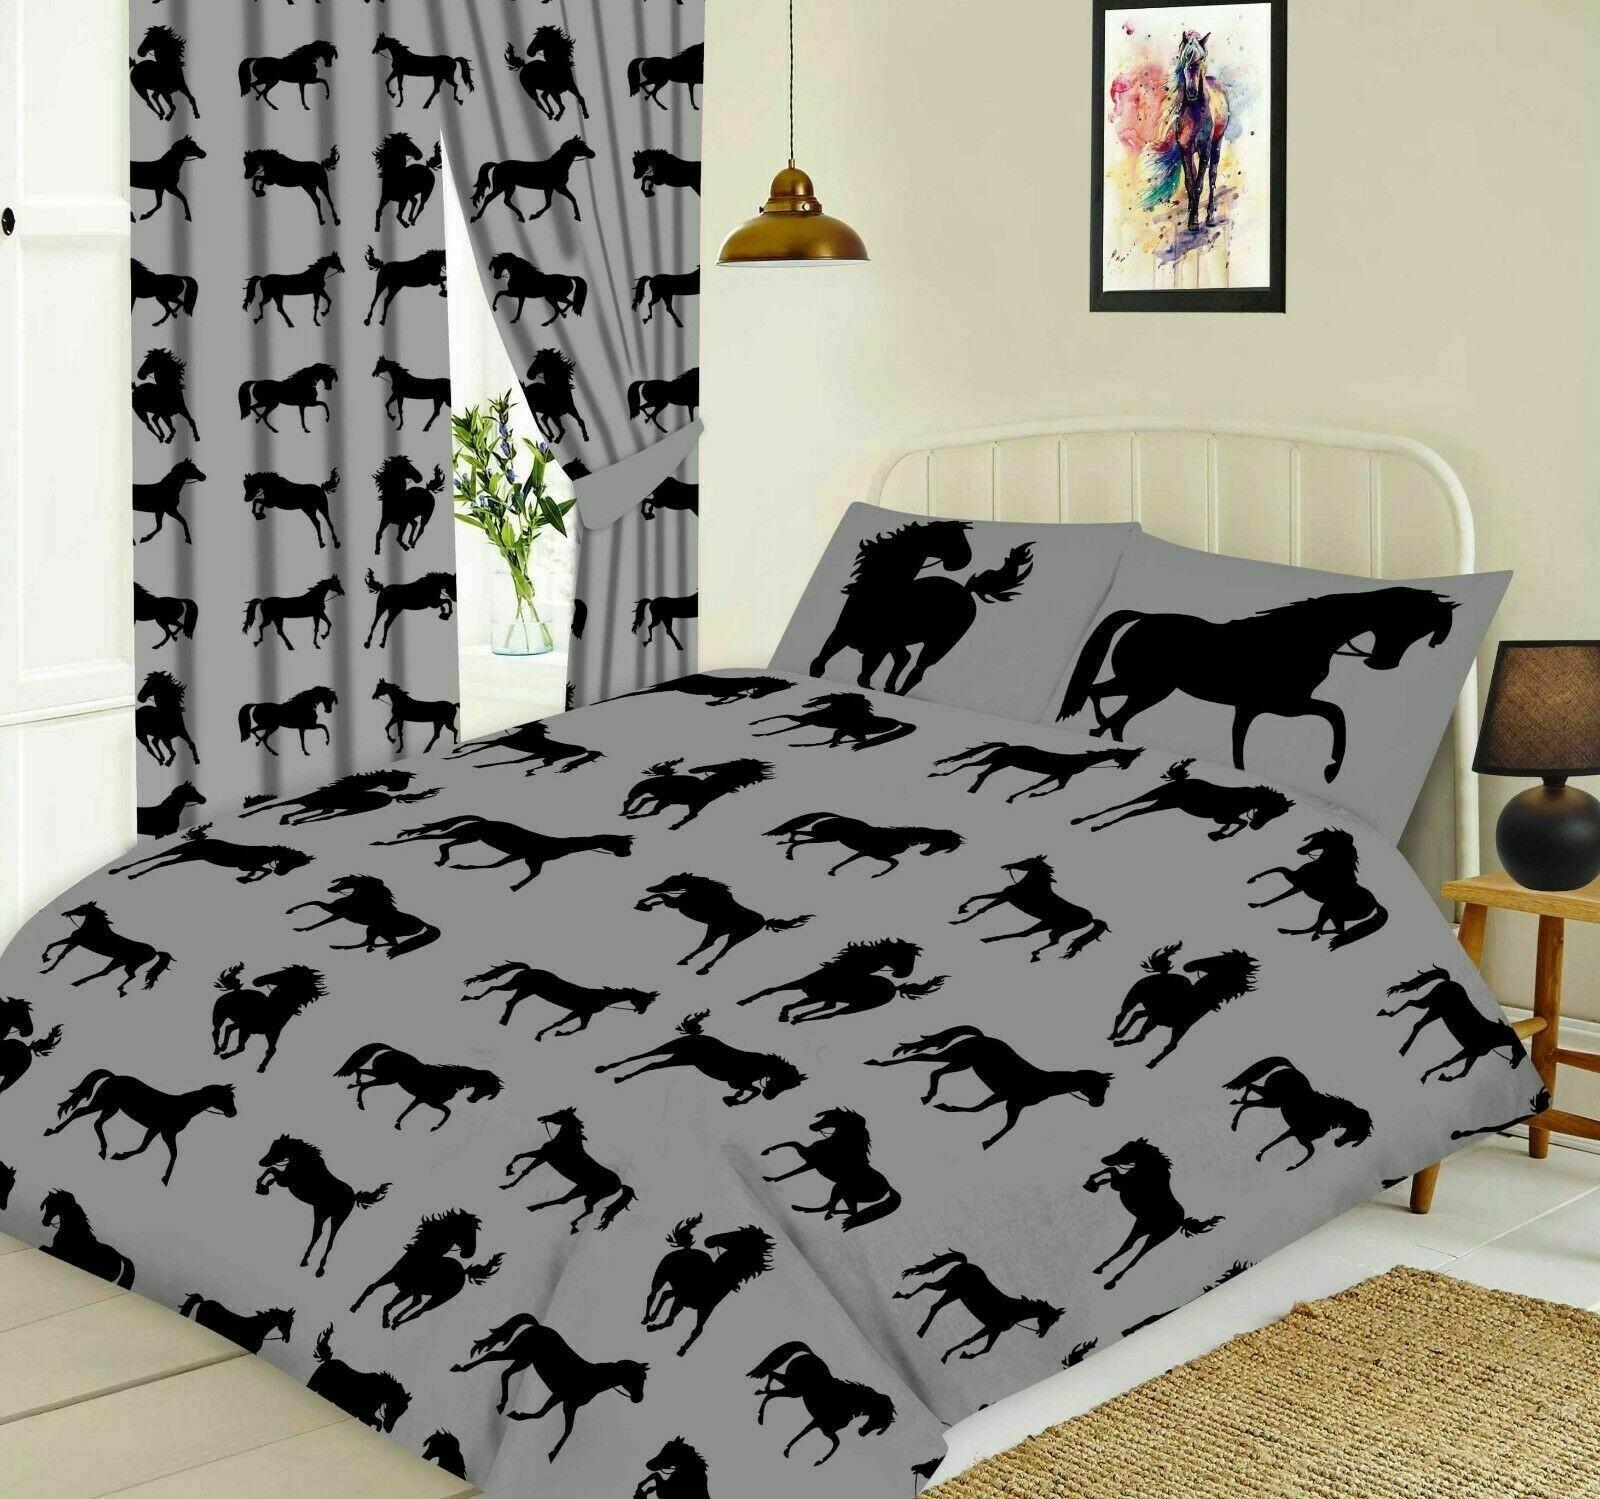 Black Horse Silhouette Design Slate Grey Double Bed Duvet Cover Bedding Set